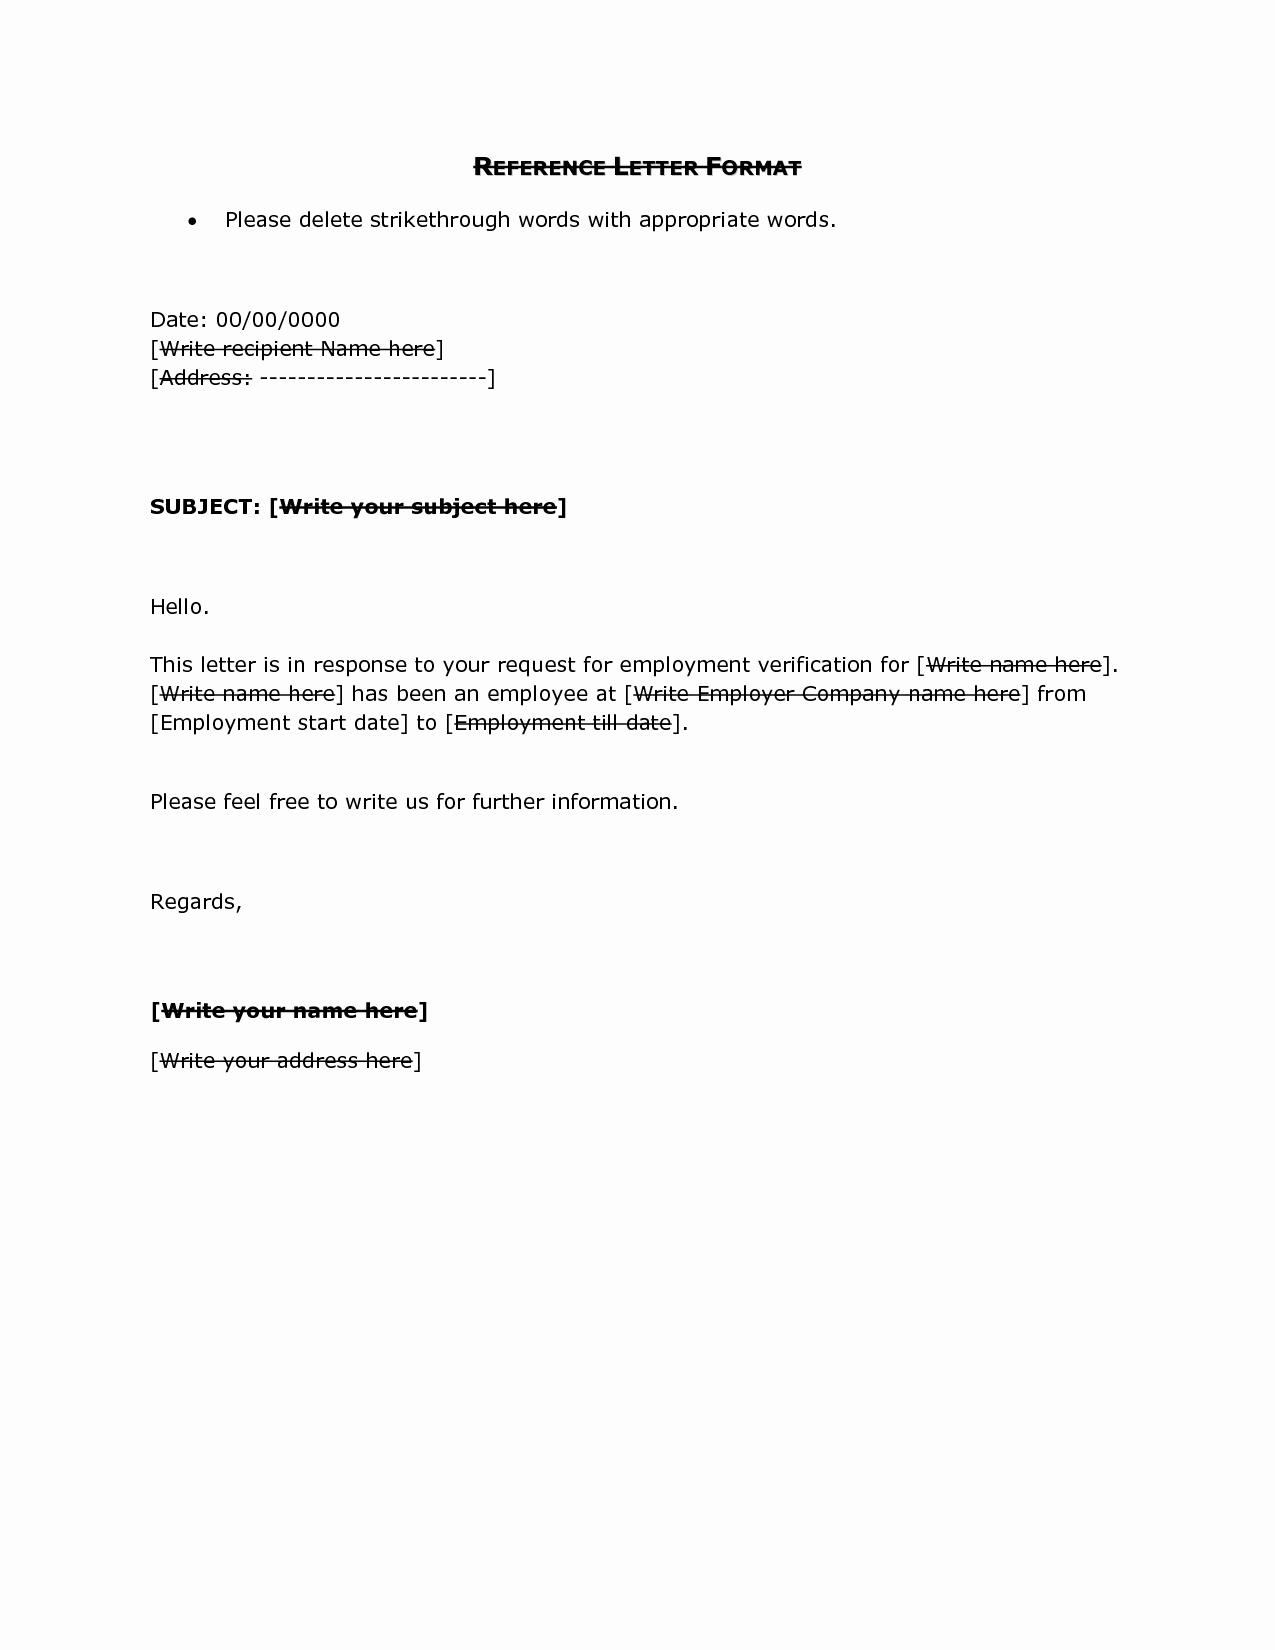 Letter asking for Referrals From Medical Professionals Elegant Reference Letter format Doc Reference Letter